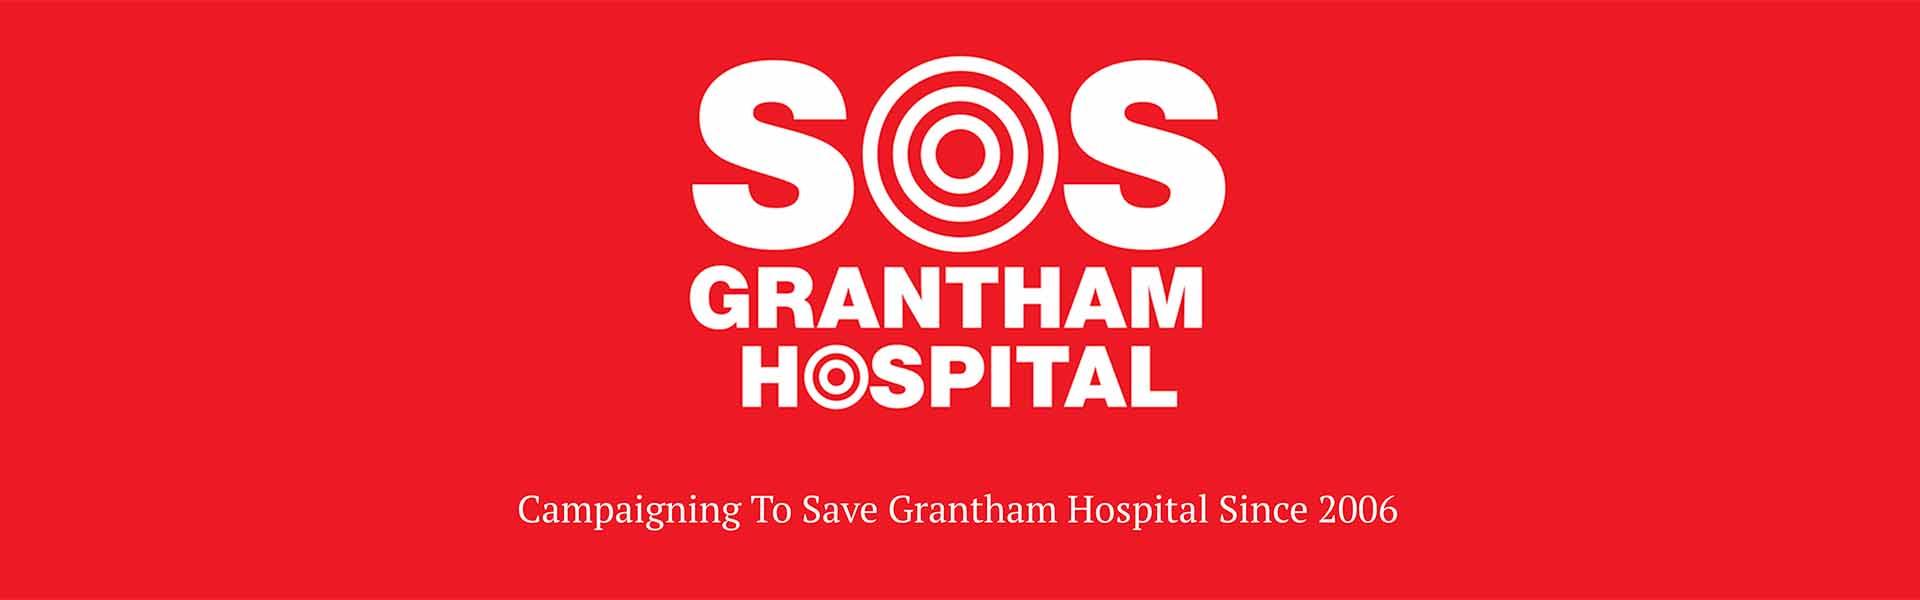 Web Design UK Portfolio SOS Grantham Hospital